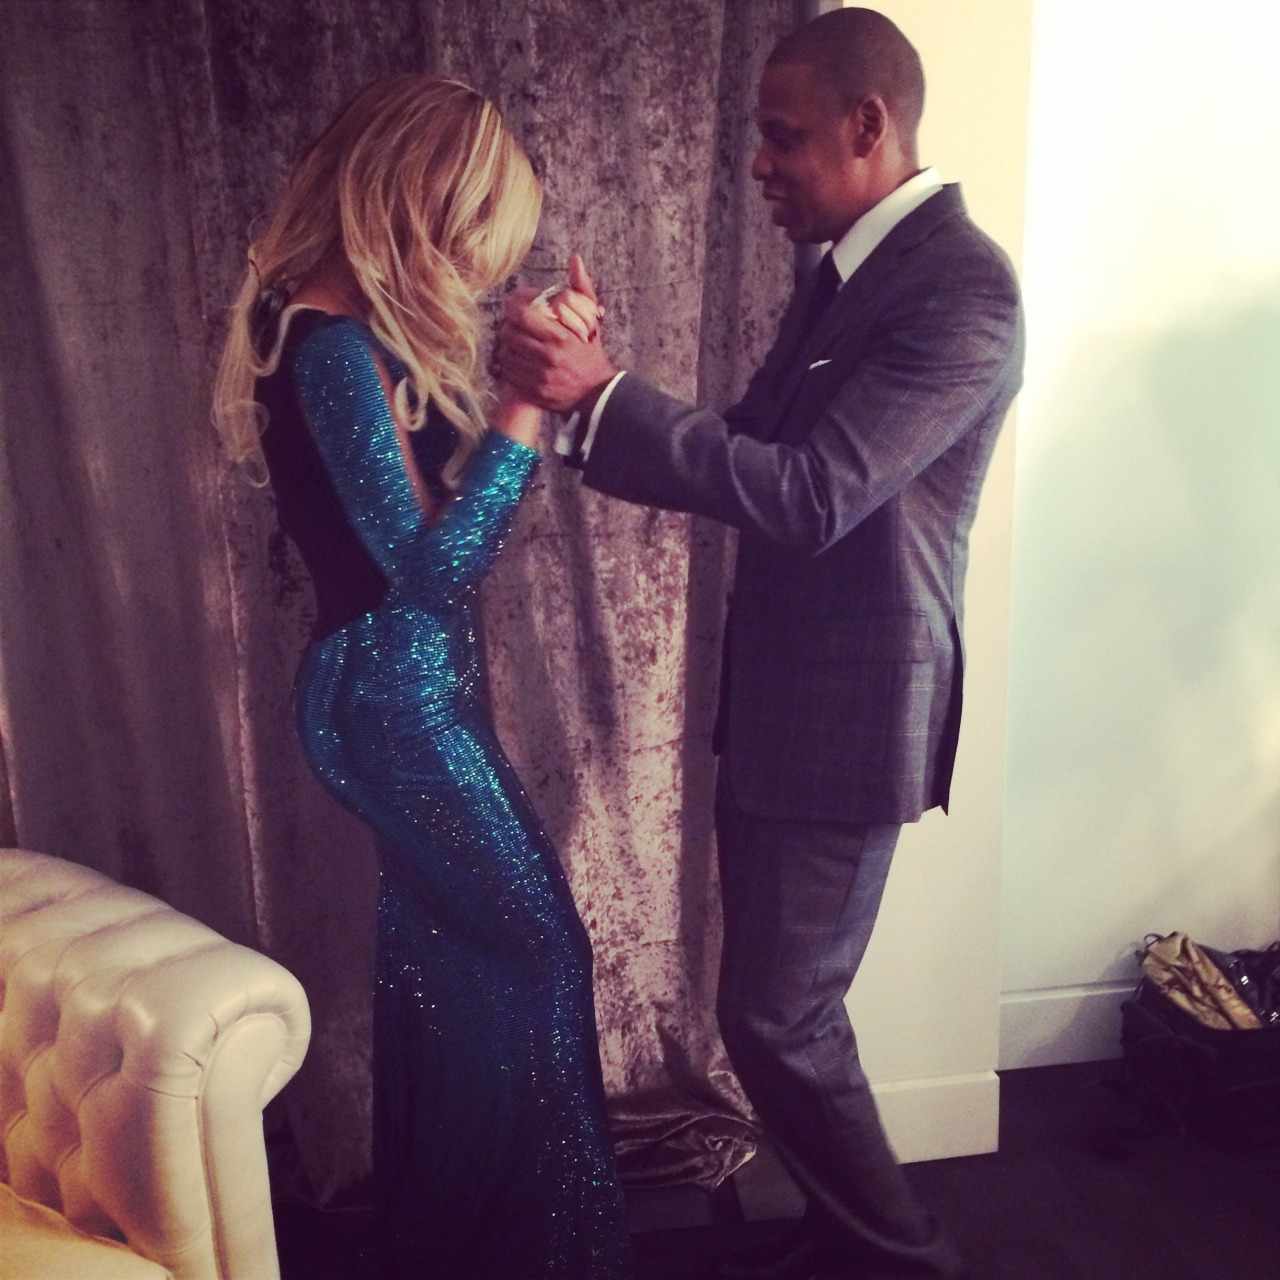 Beyoncé - Twitter (@Beyonce), Instagram (Baddiebey), Tumblr (I Am...) [II] - Página 3 Tumblr_n19o4bcaNo1rqgjz2o1_1280